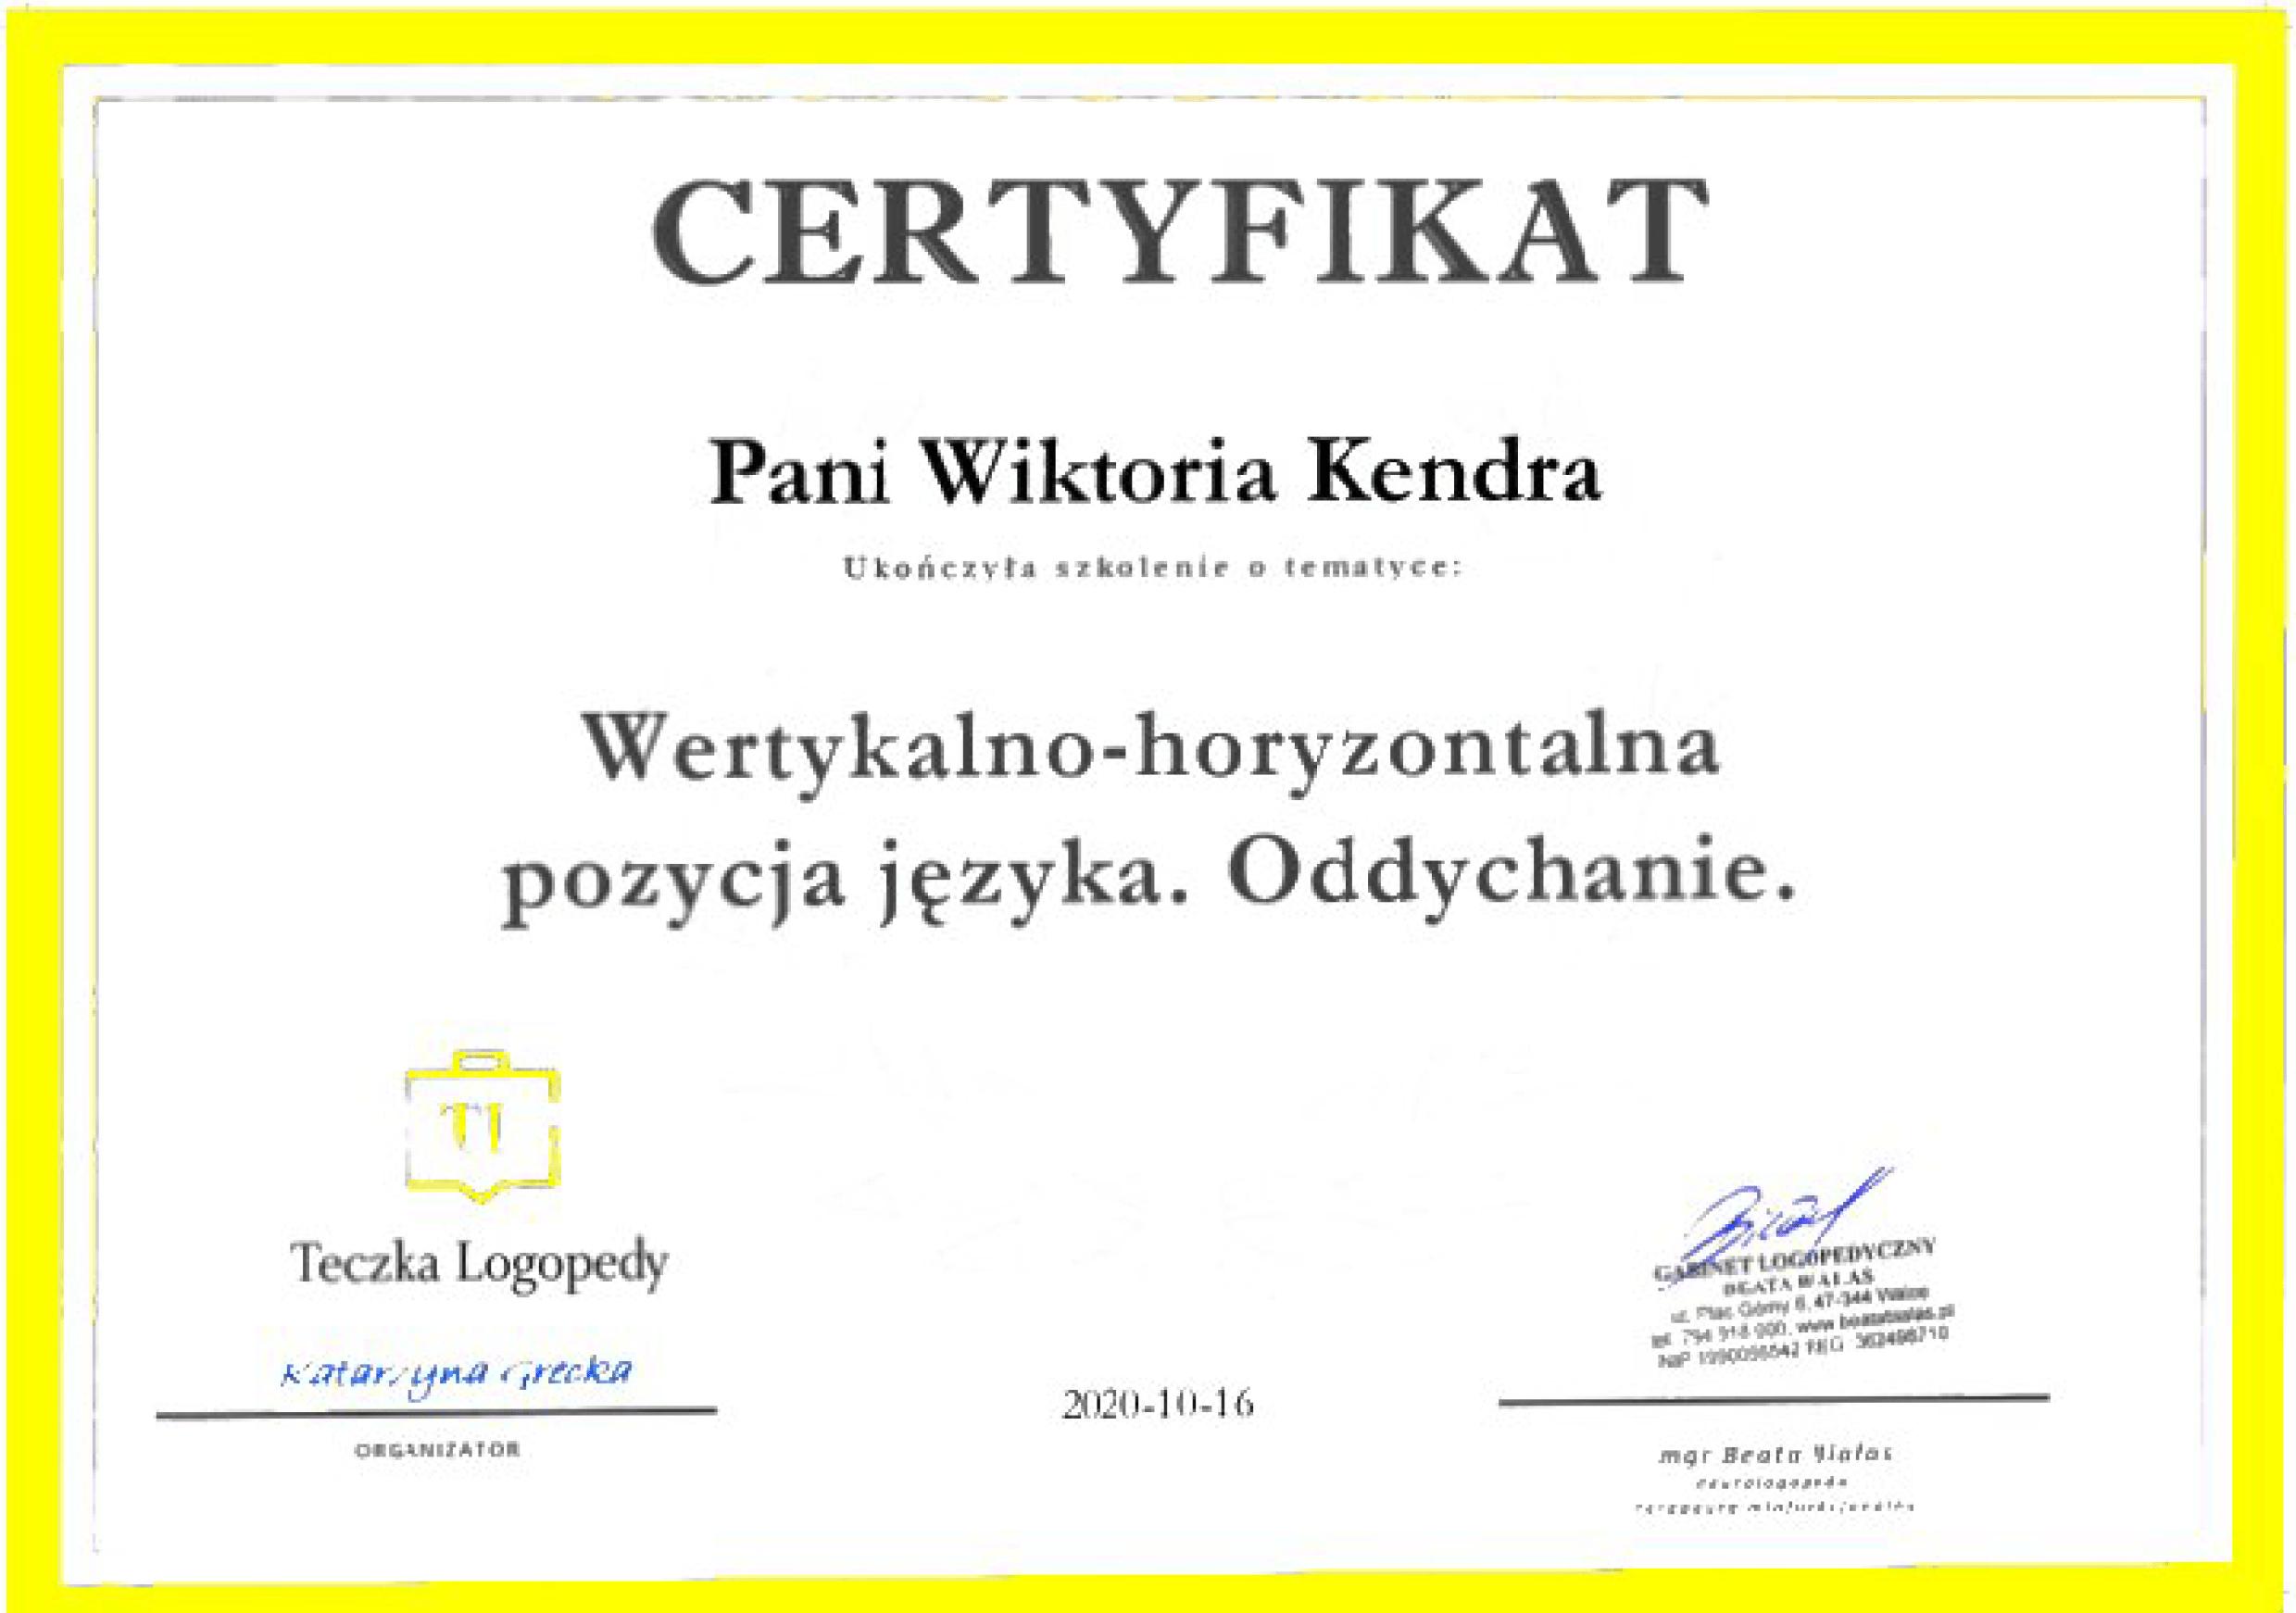 Certyfikat WK 2